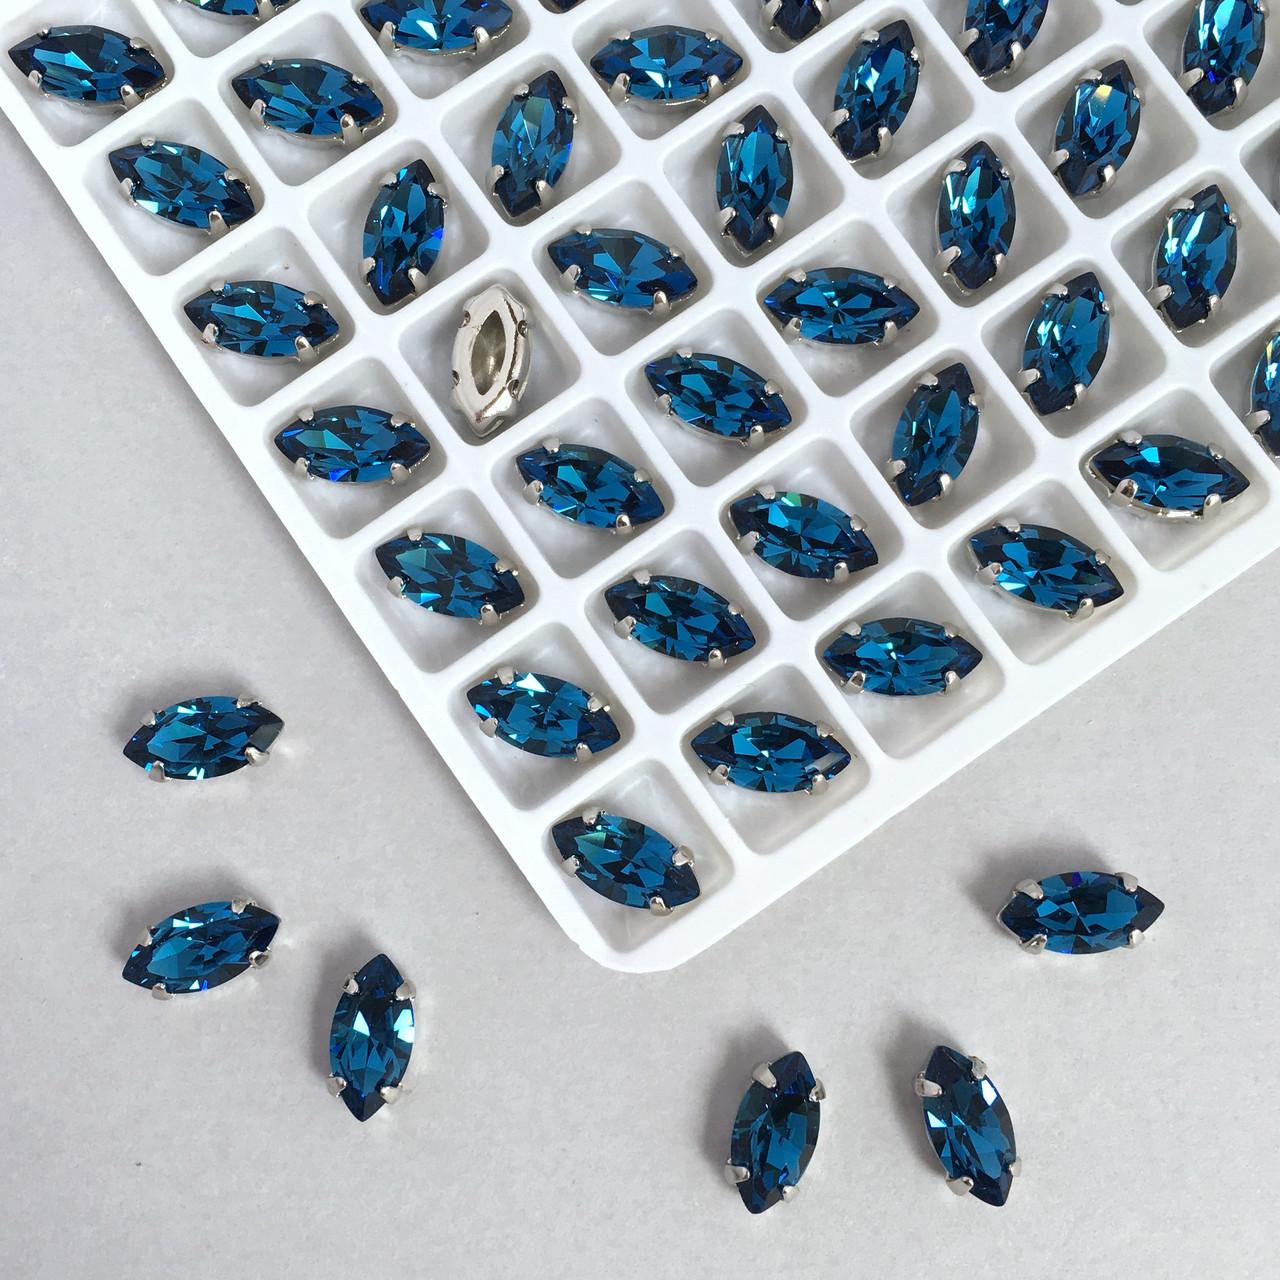 Кристаллы  LUX Маркизы (лодочки) 5х10 мм в цапах. Цвет: Монтана